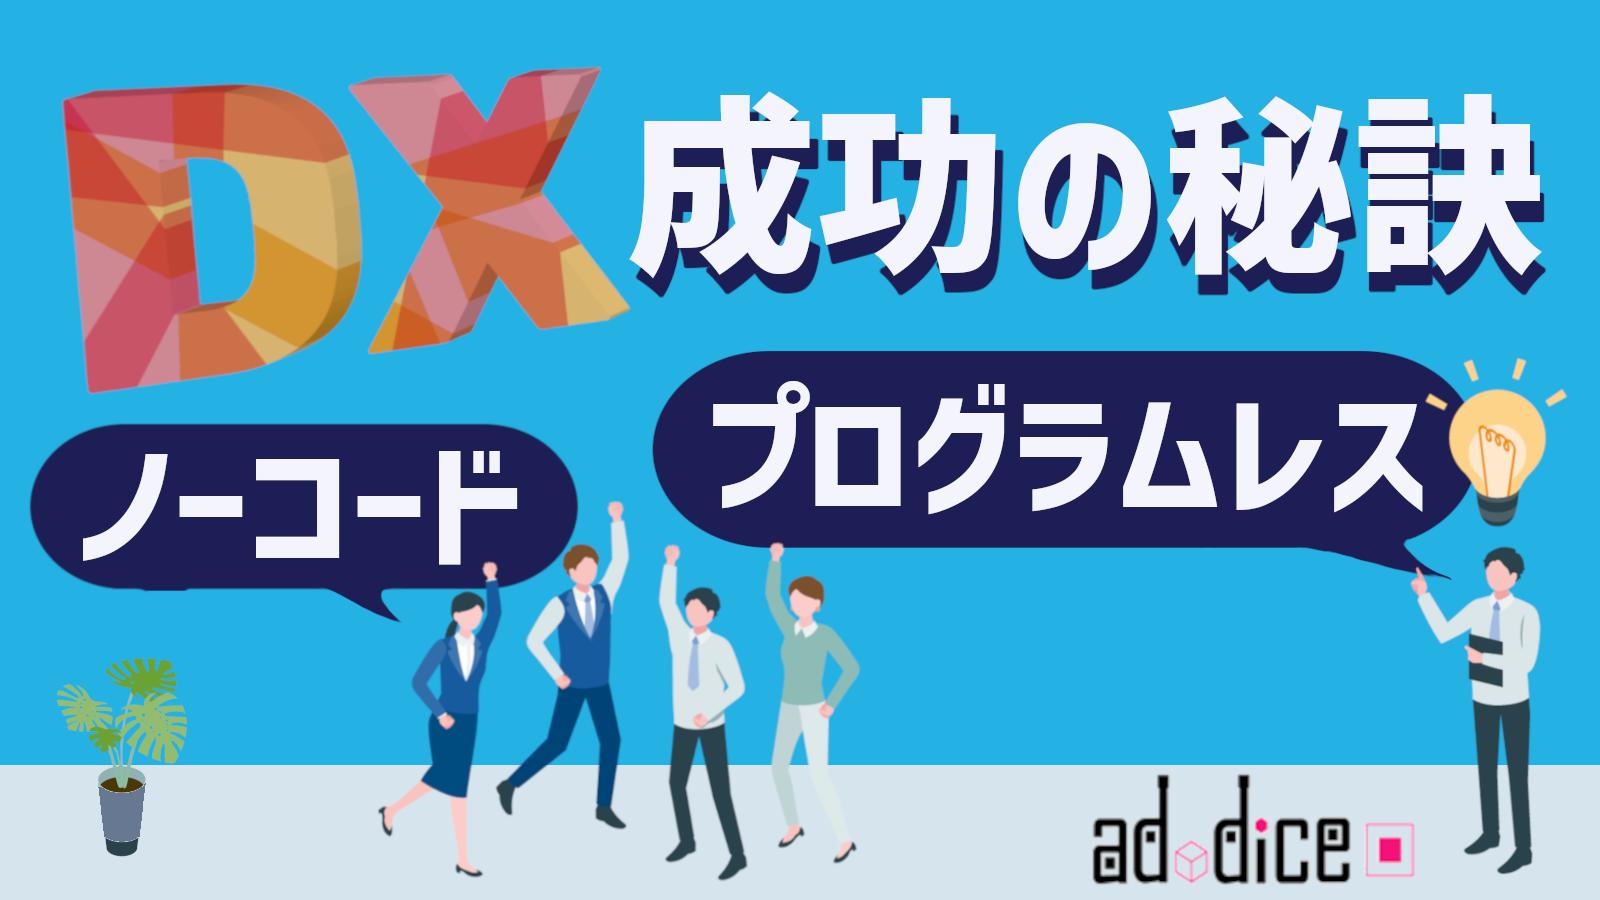 DX × AI